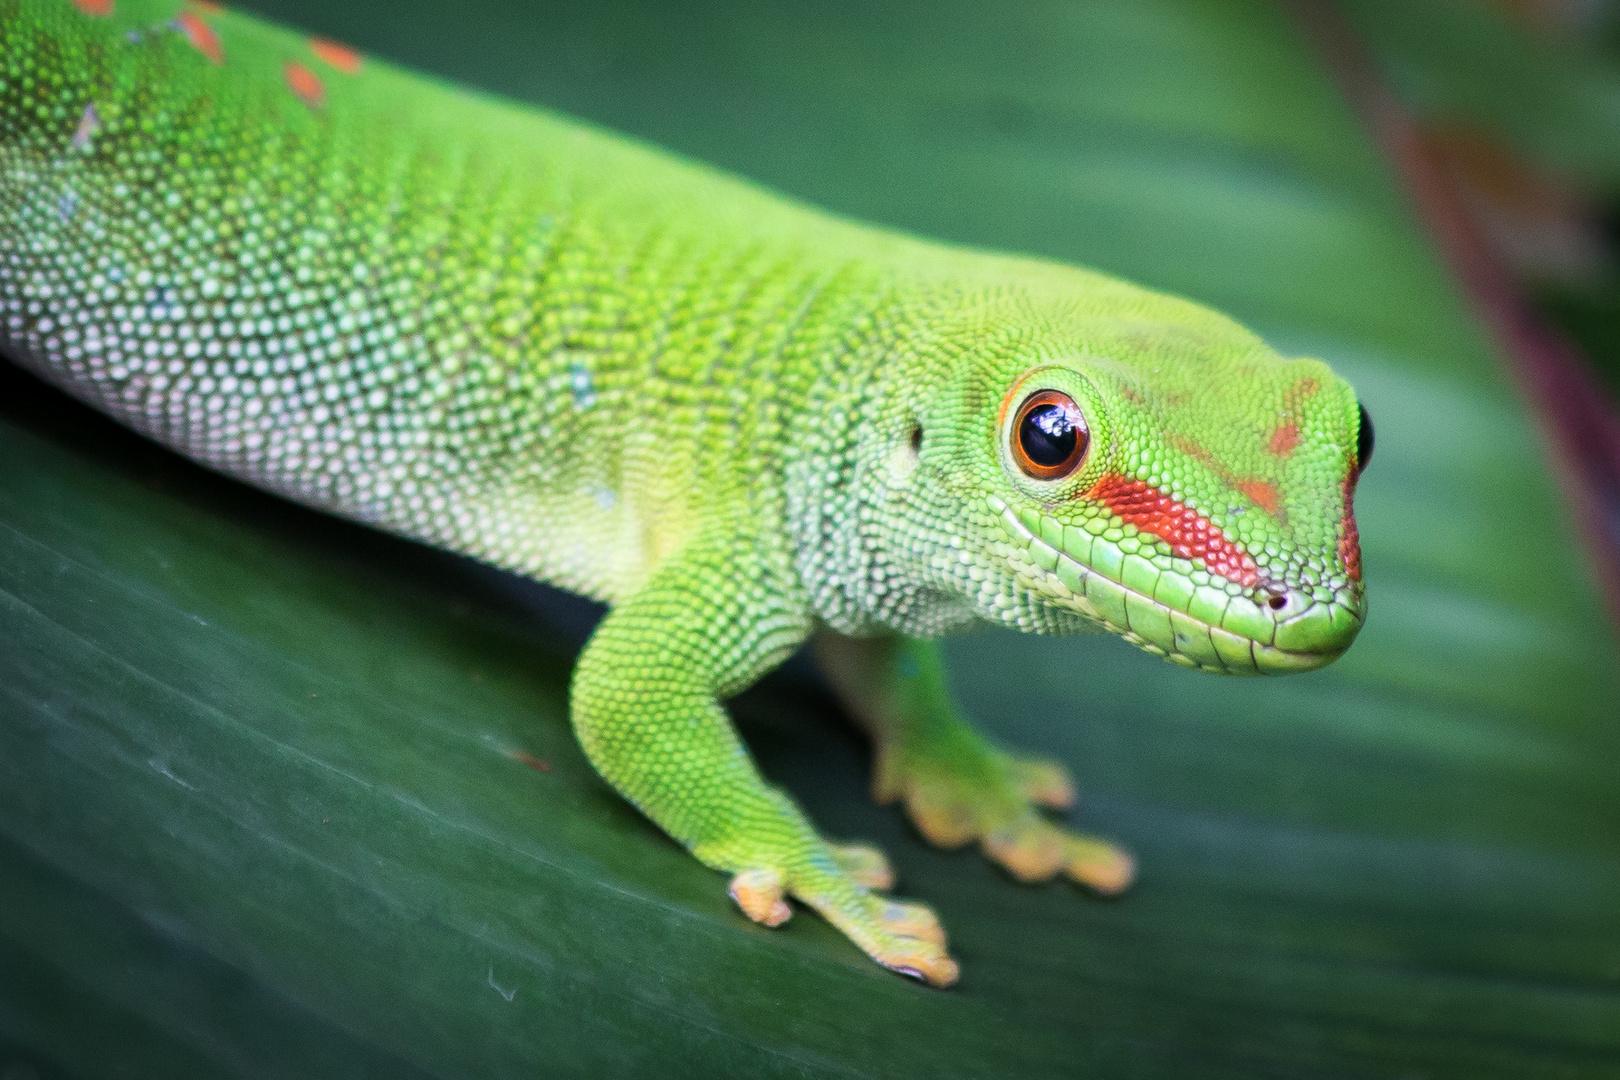 Grosser Madagaskar Taggecko